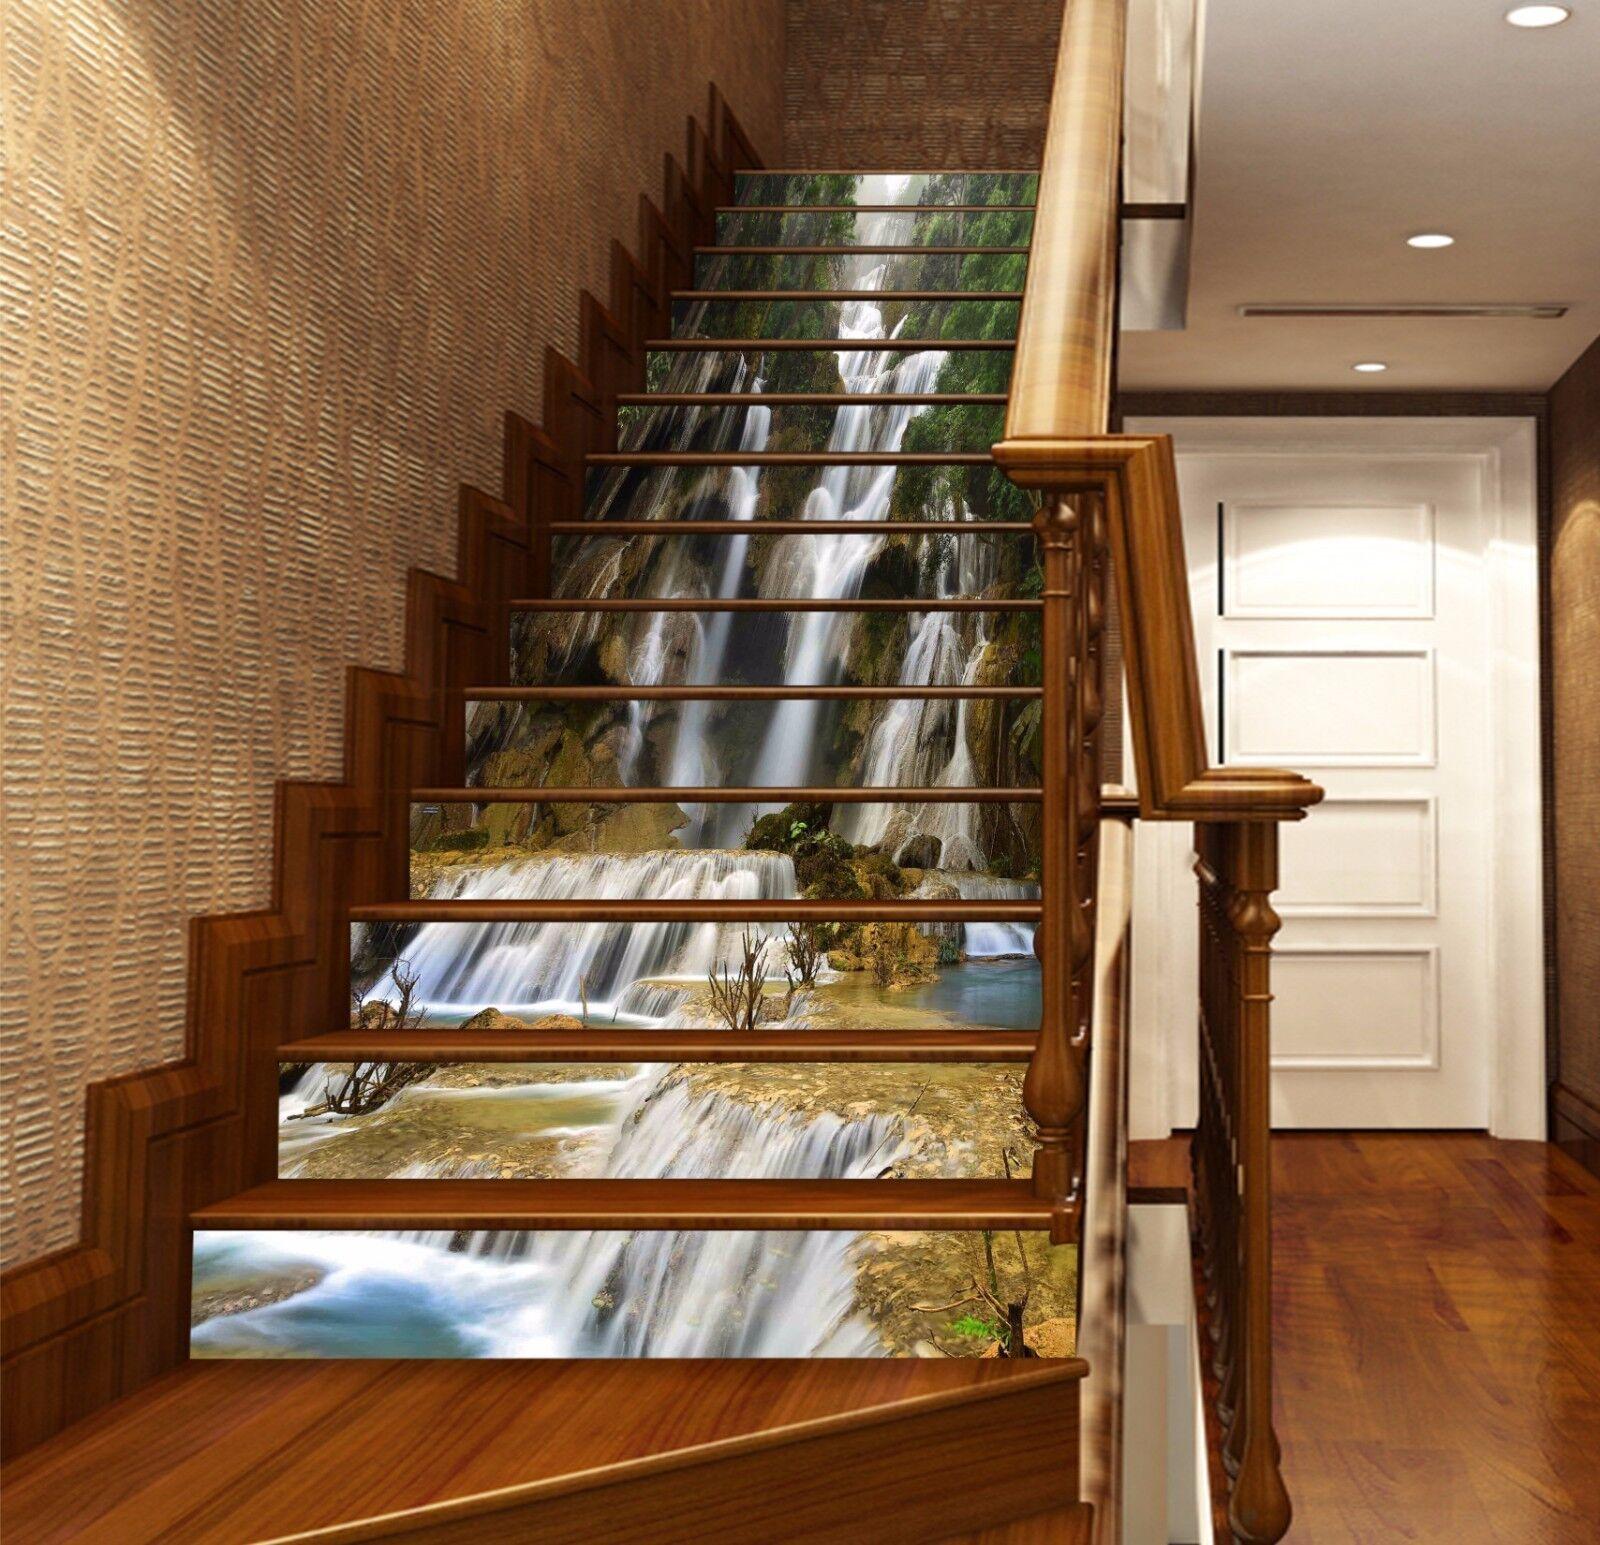 3D Waterfall 823 Stair Risers Decoration Photo Mural Vinyl Decal Wallpaper AU